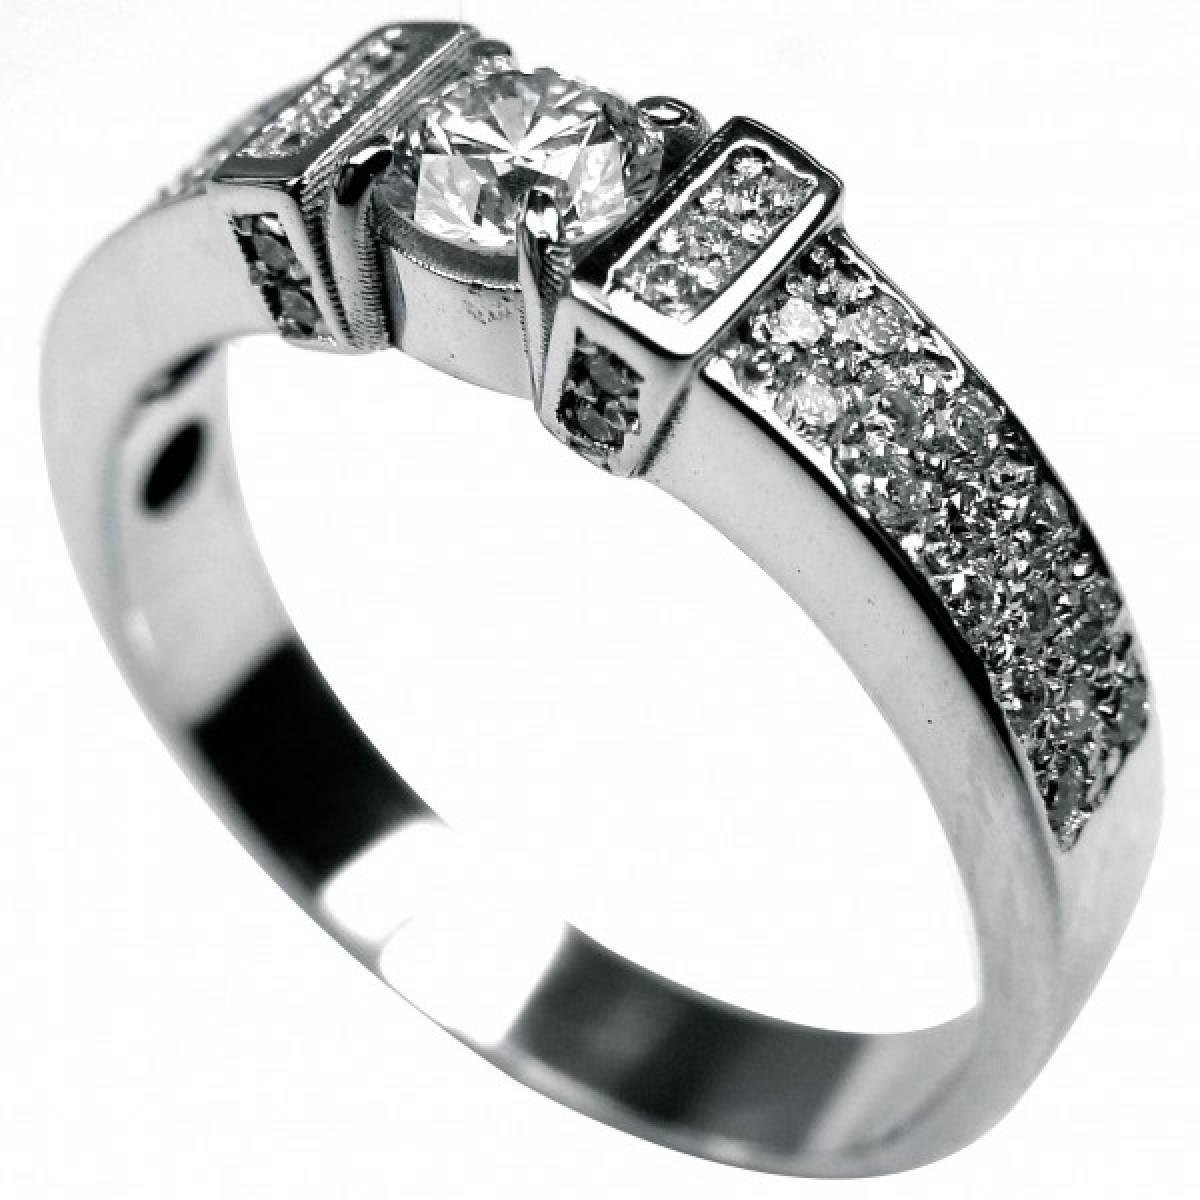 Anel de Noivado, ouro branco com 44 diamantes de 0,44 cts + 1 de 0,30 cts